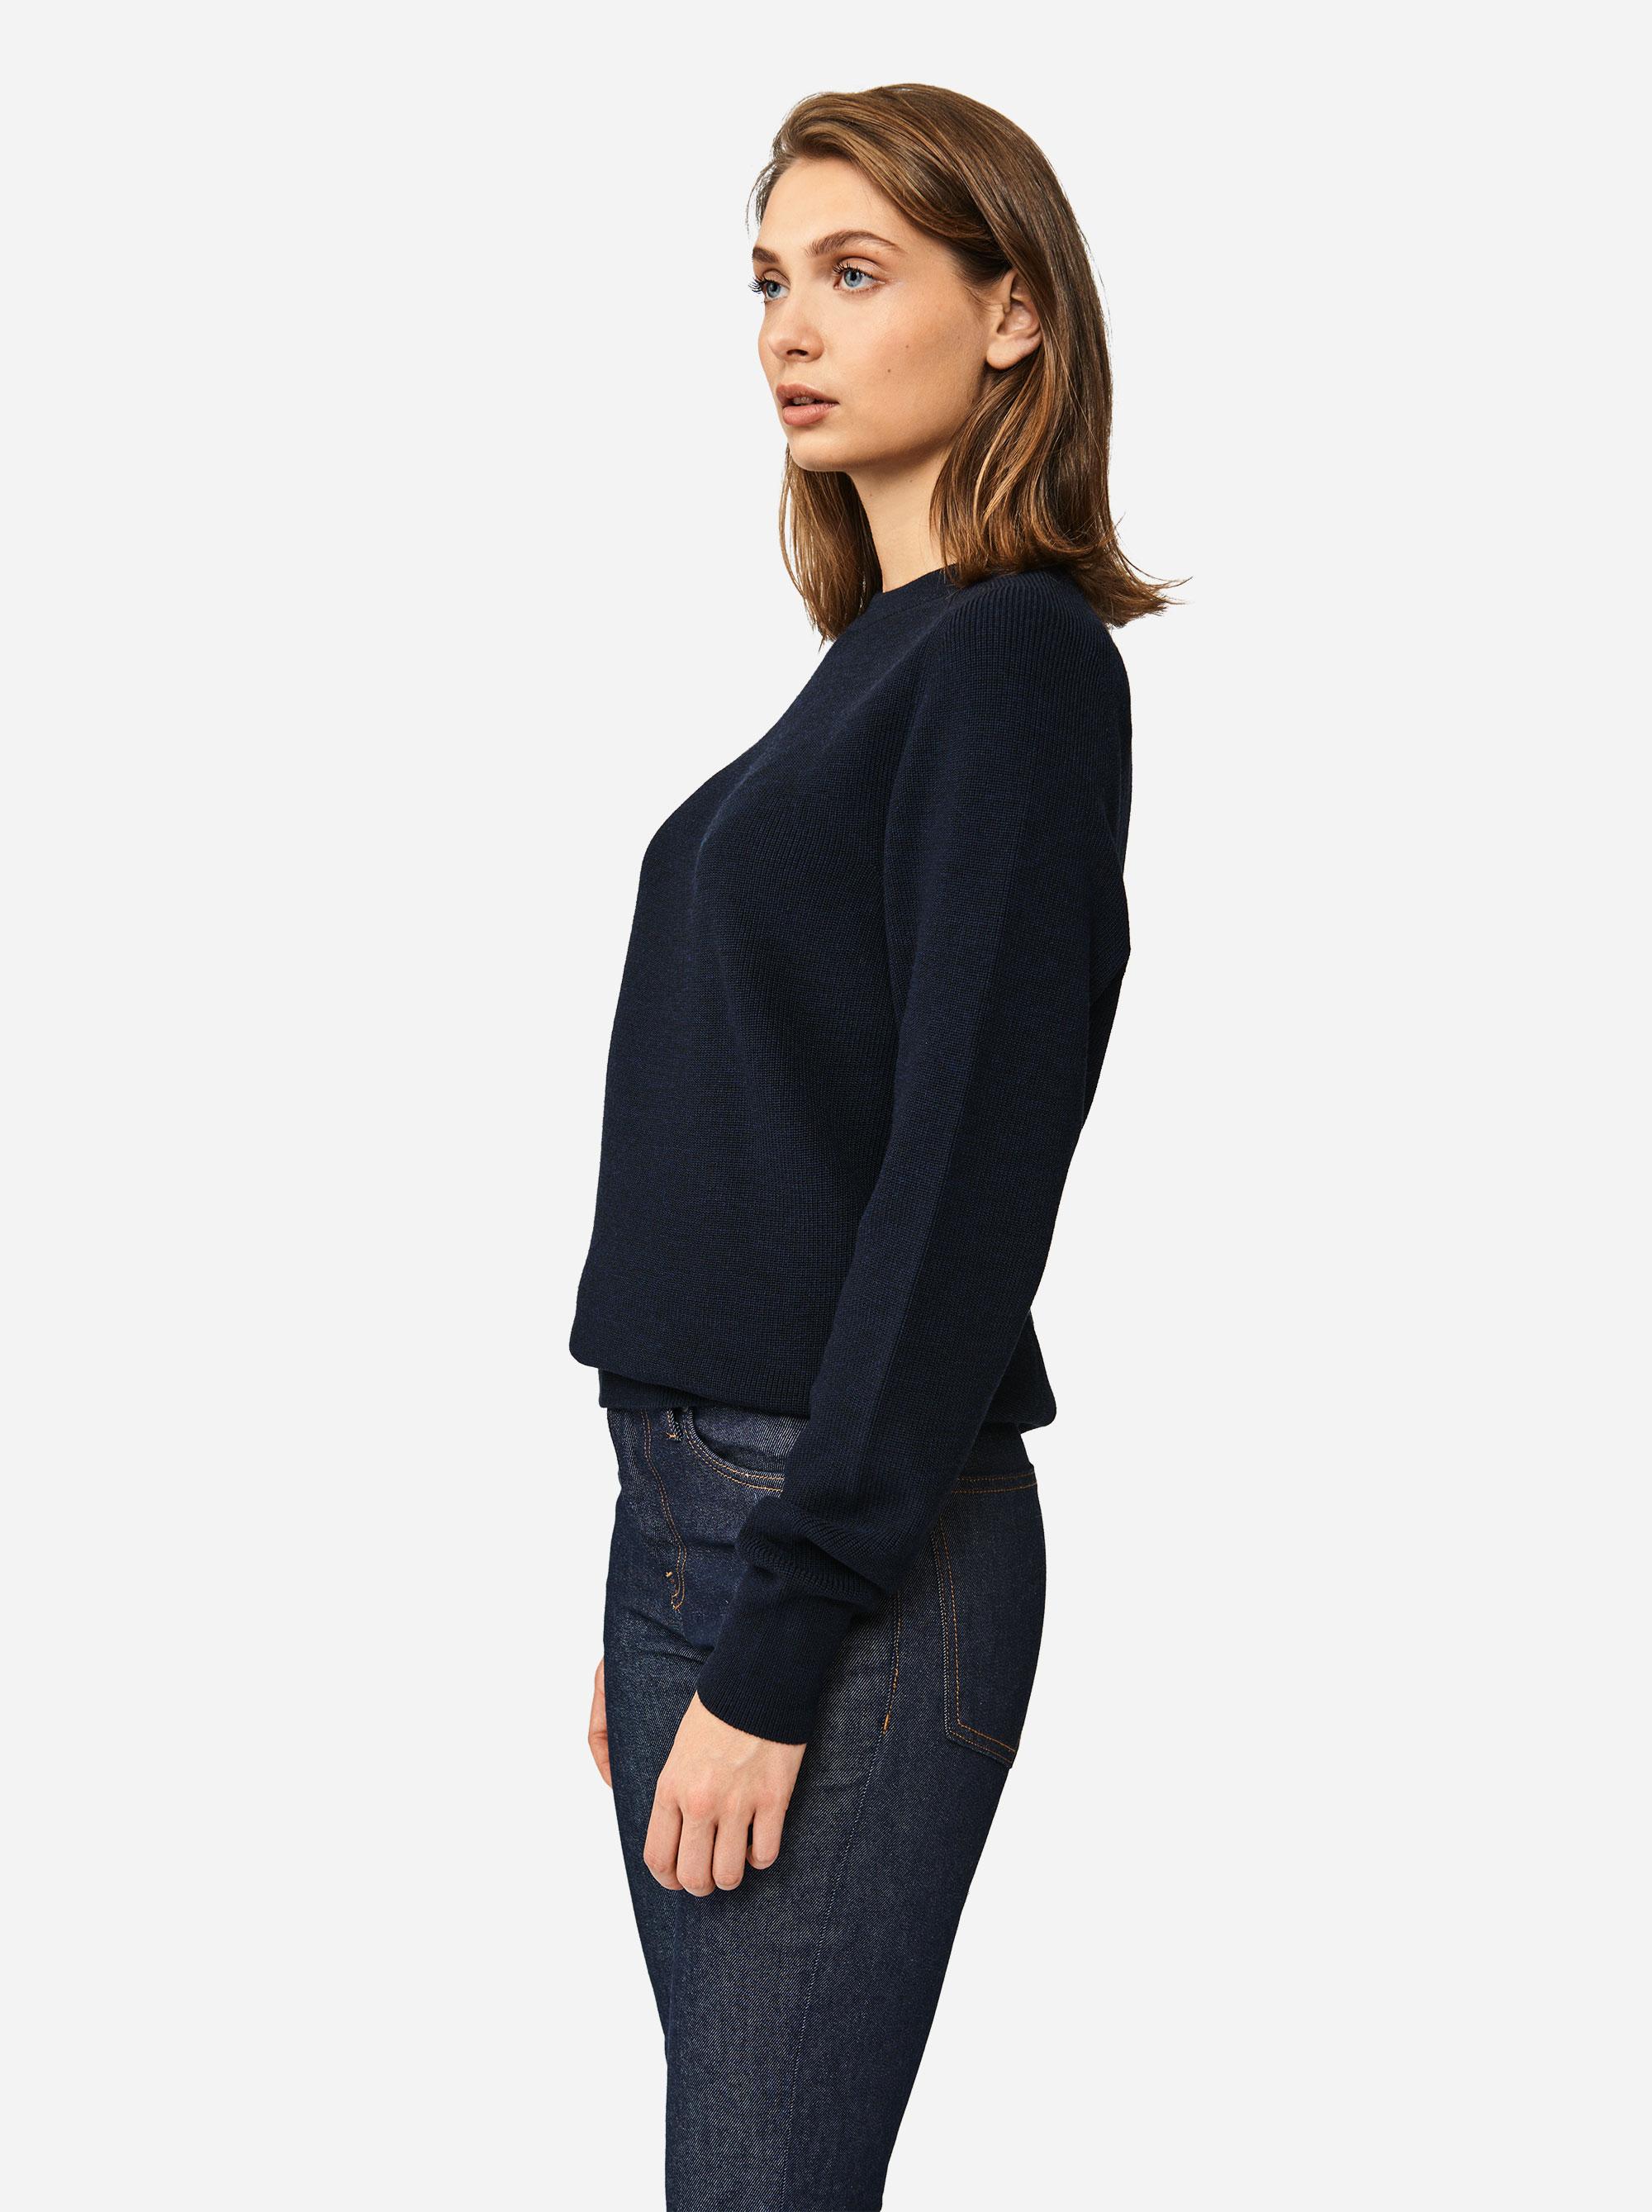 Teym - Crewneck - The Merino Sweater - Women - Blue - 1